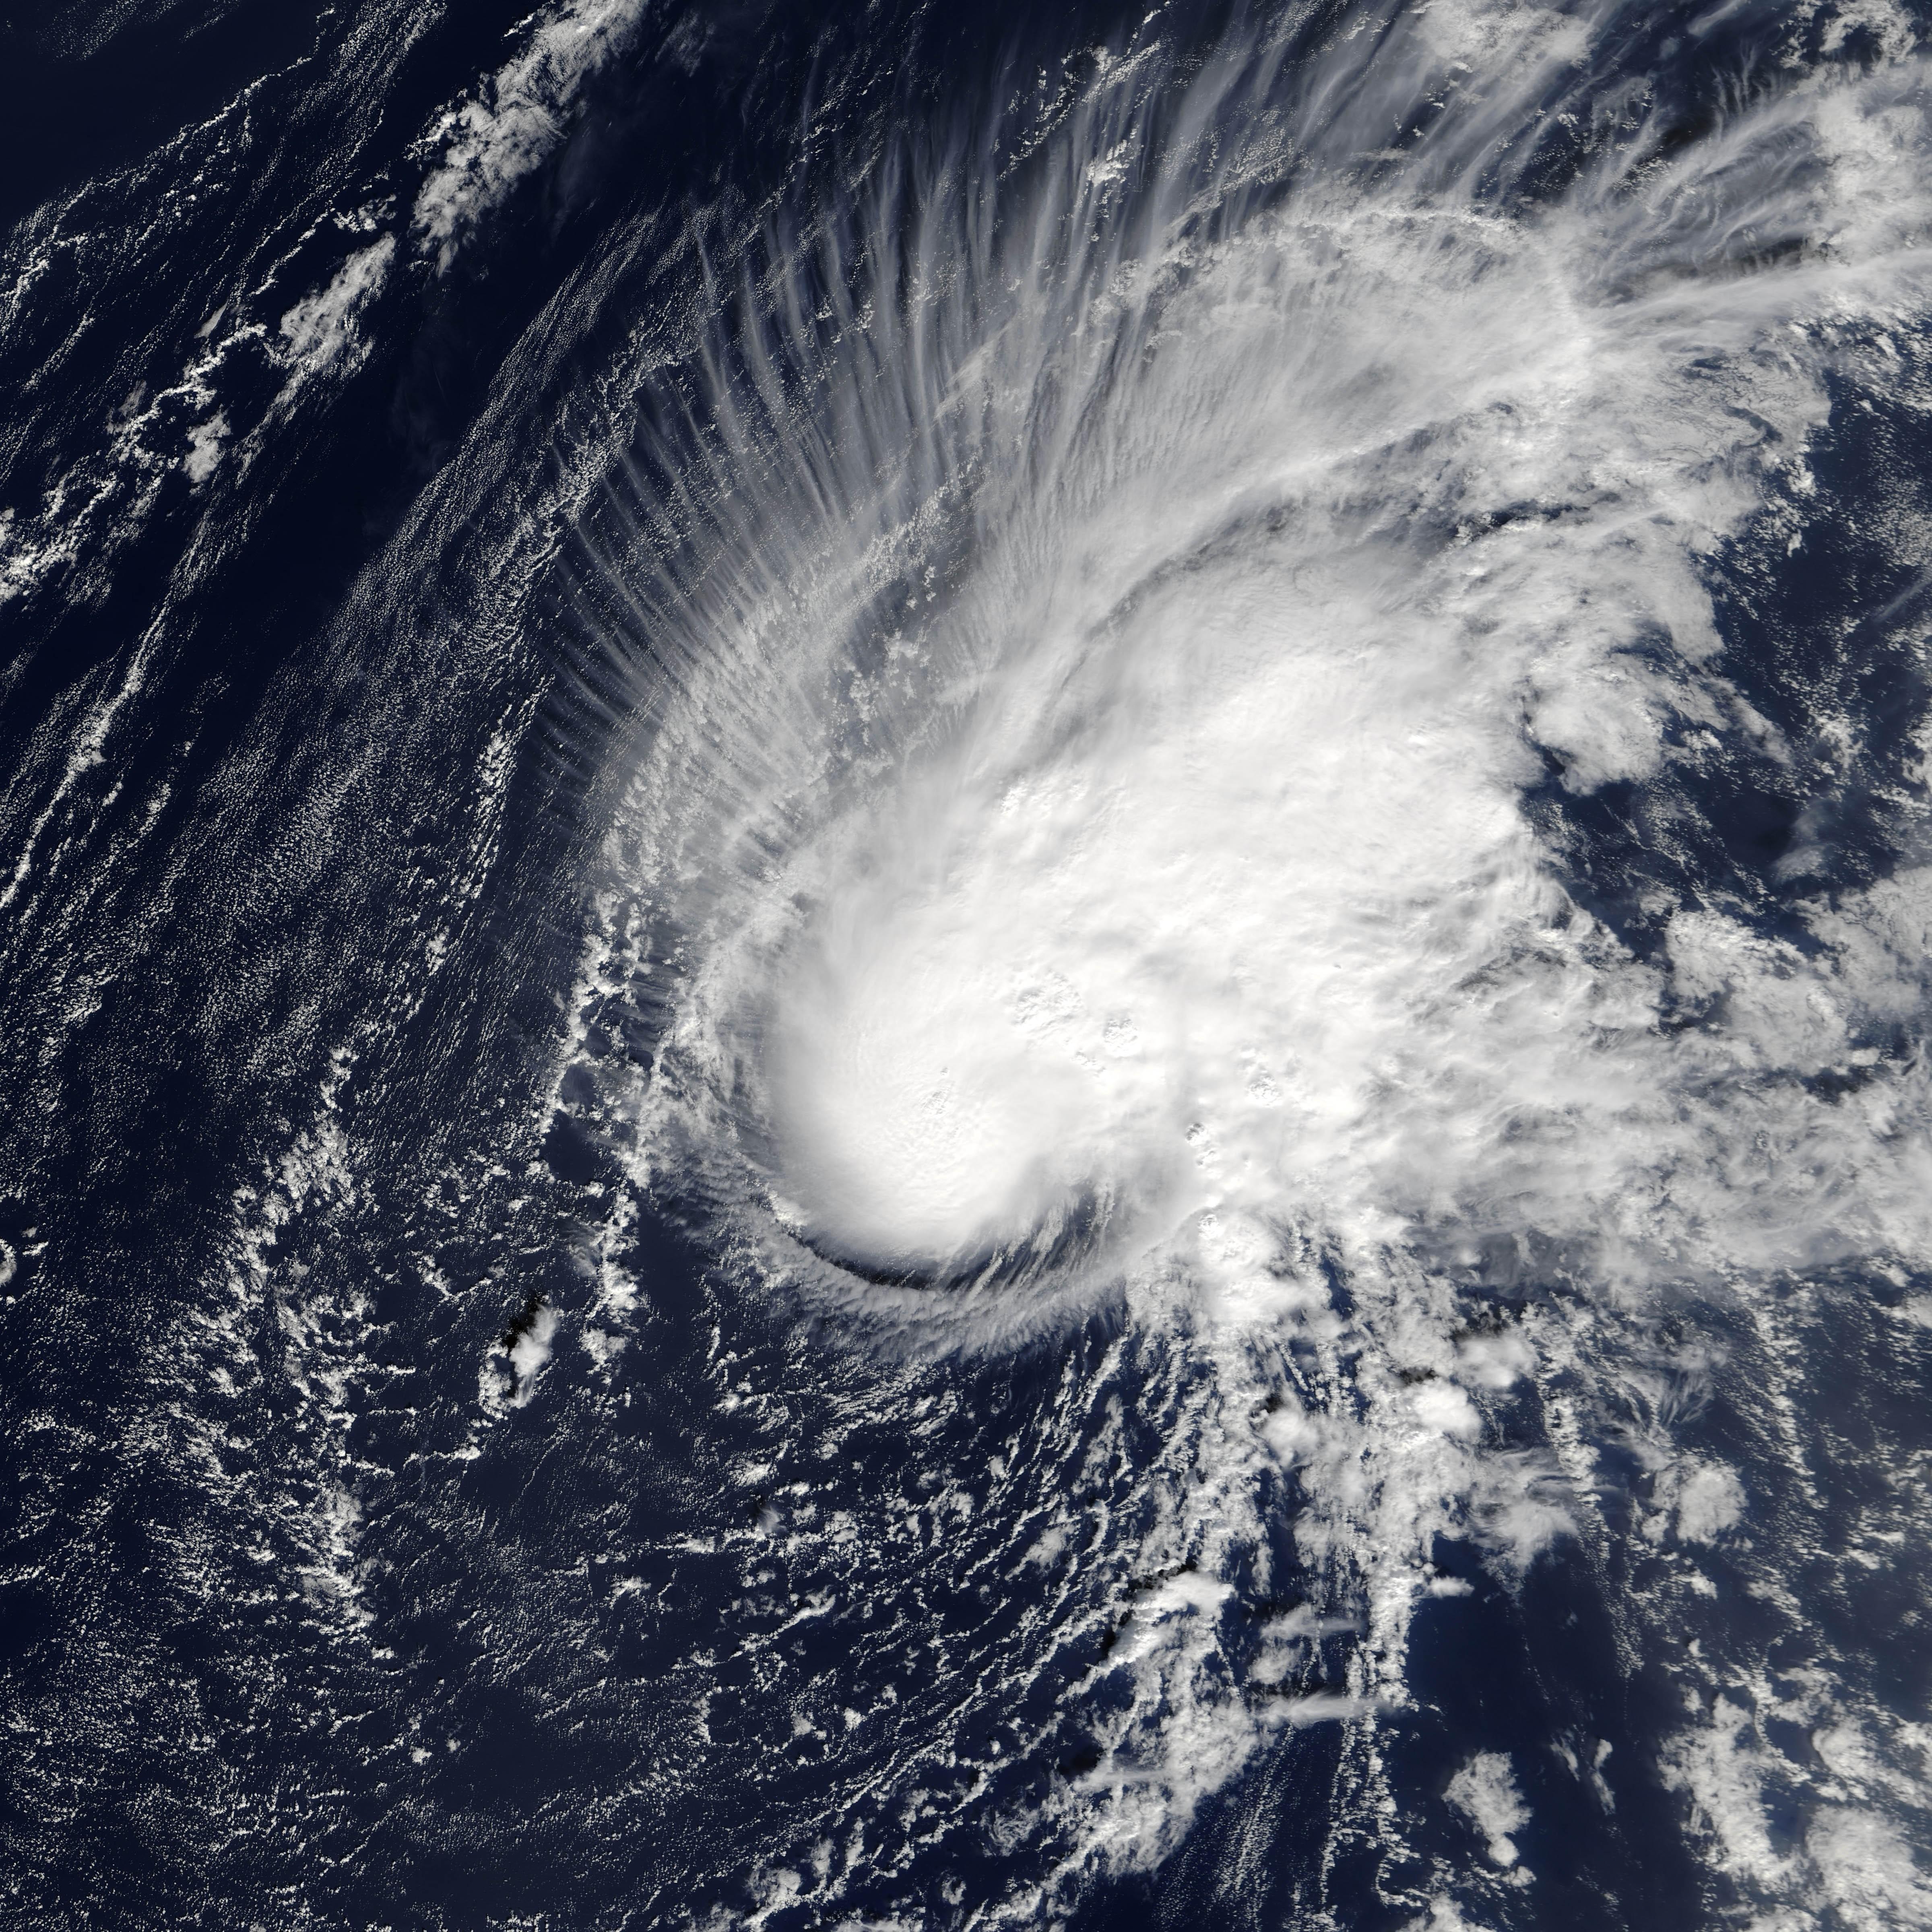 File:Tropical Storm Zeta 2005.jpg - Wikipedia, the free encyclopedia